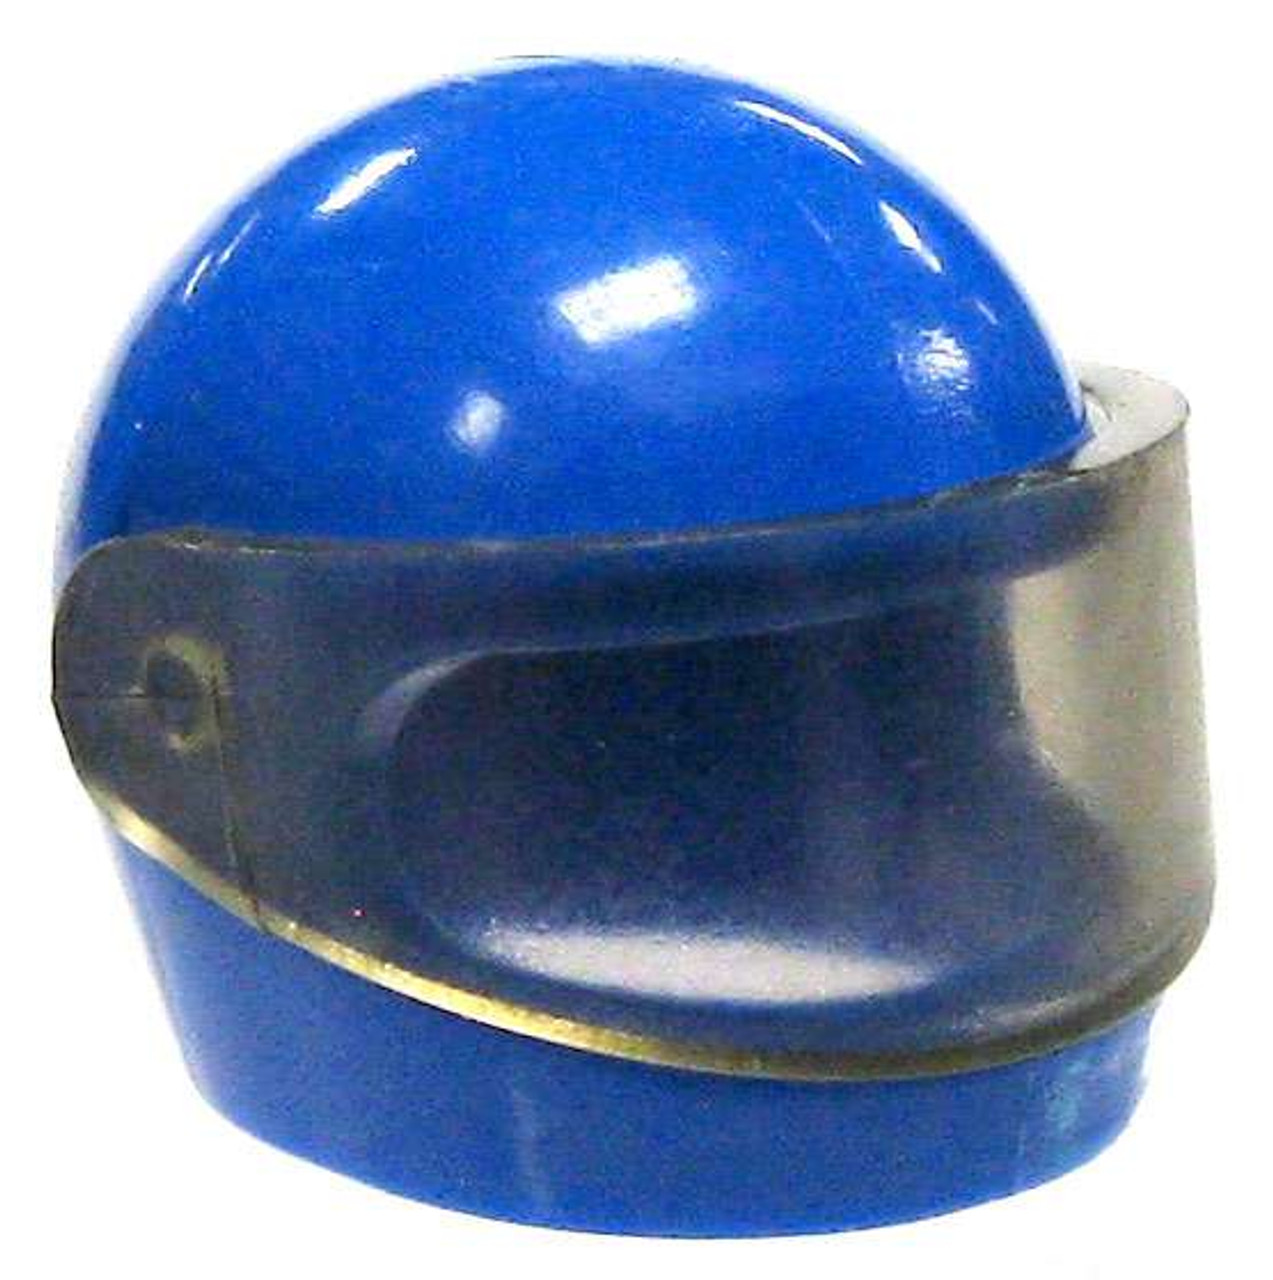 ac298350 LEGO Headgear Blue Motorcycle Helmet with Dark Transparent Visor Loose -  ToyWiz